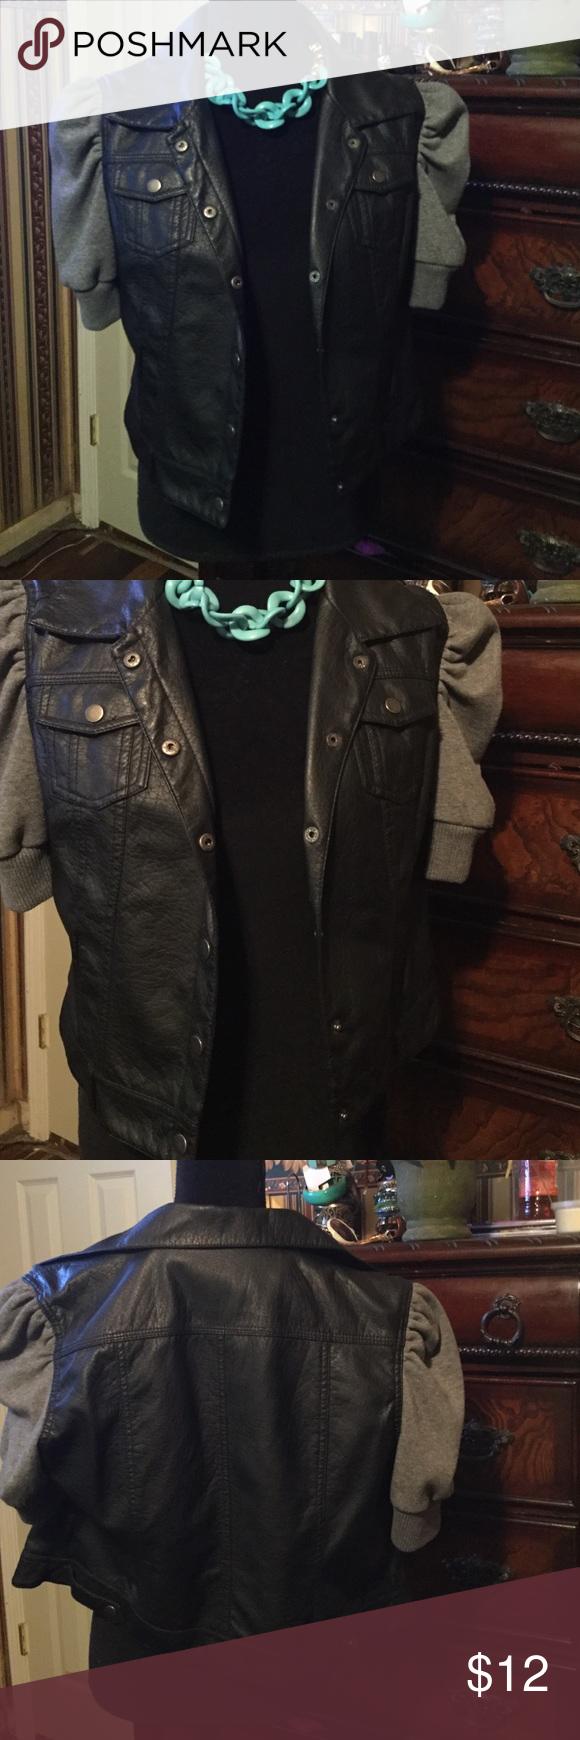 Pleather shirt/jacket/vest Pleather vest, shirt, jacket Last Kiss Tops